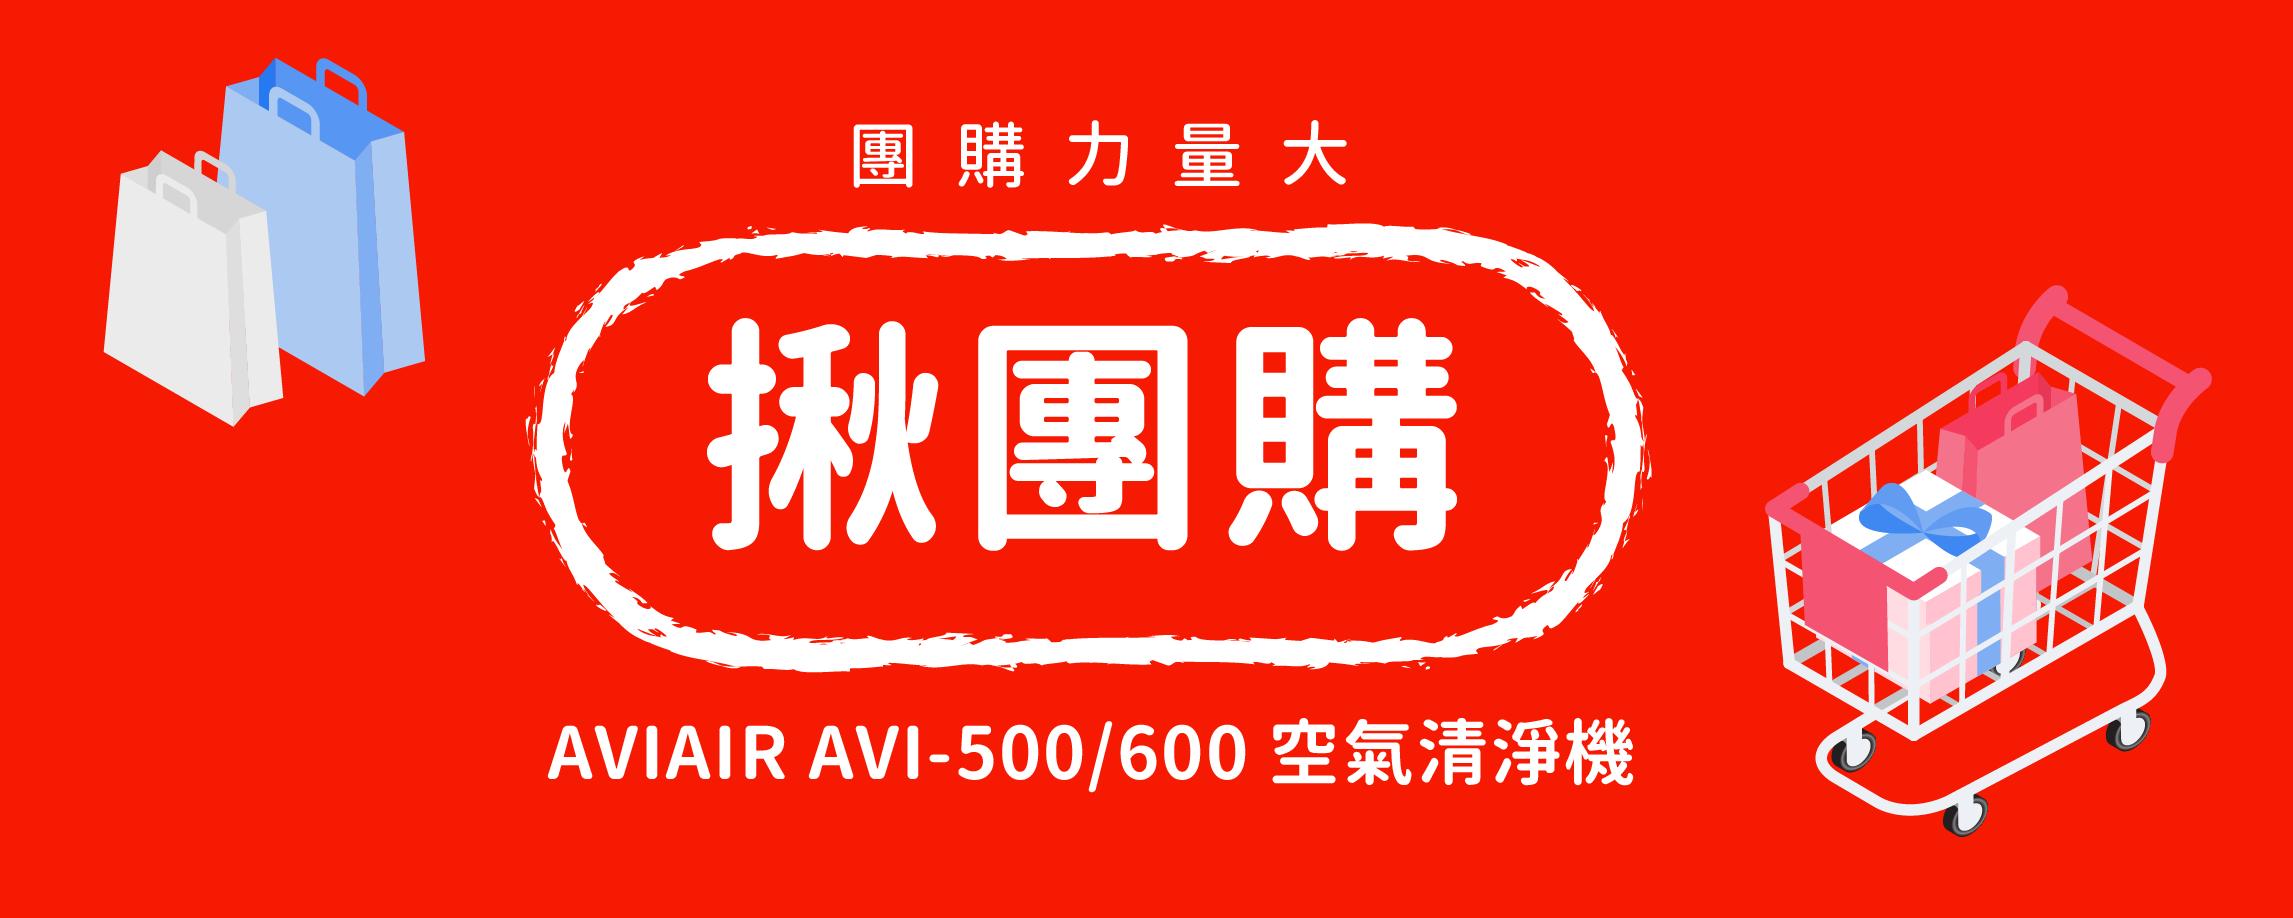 團購AVIAIR空氣清淨機_AVI-500_AVI-600_banner